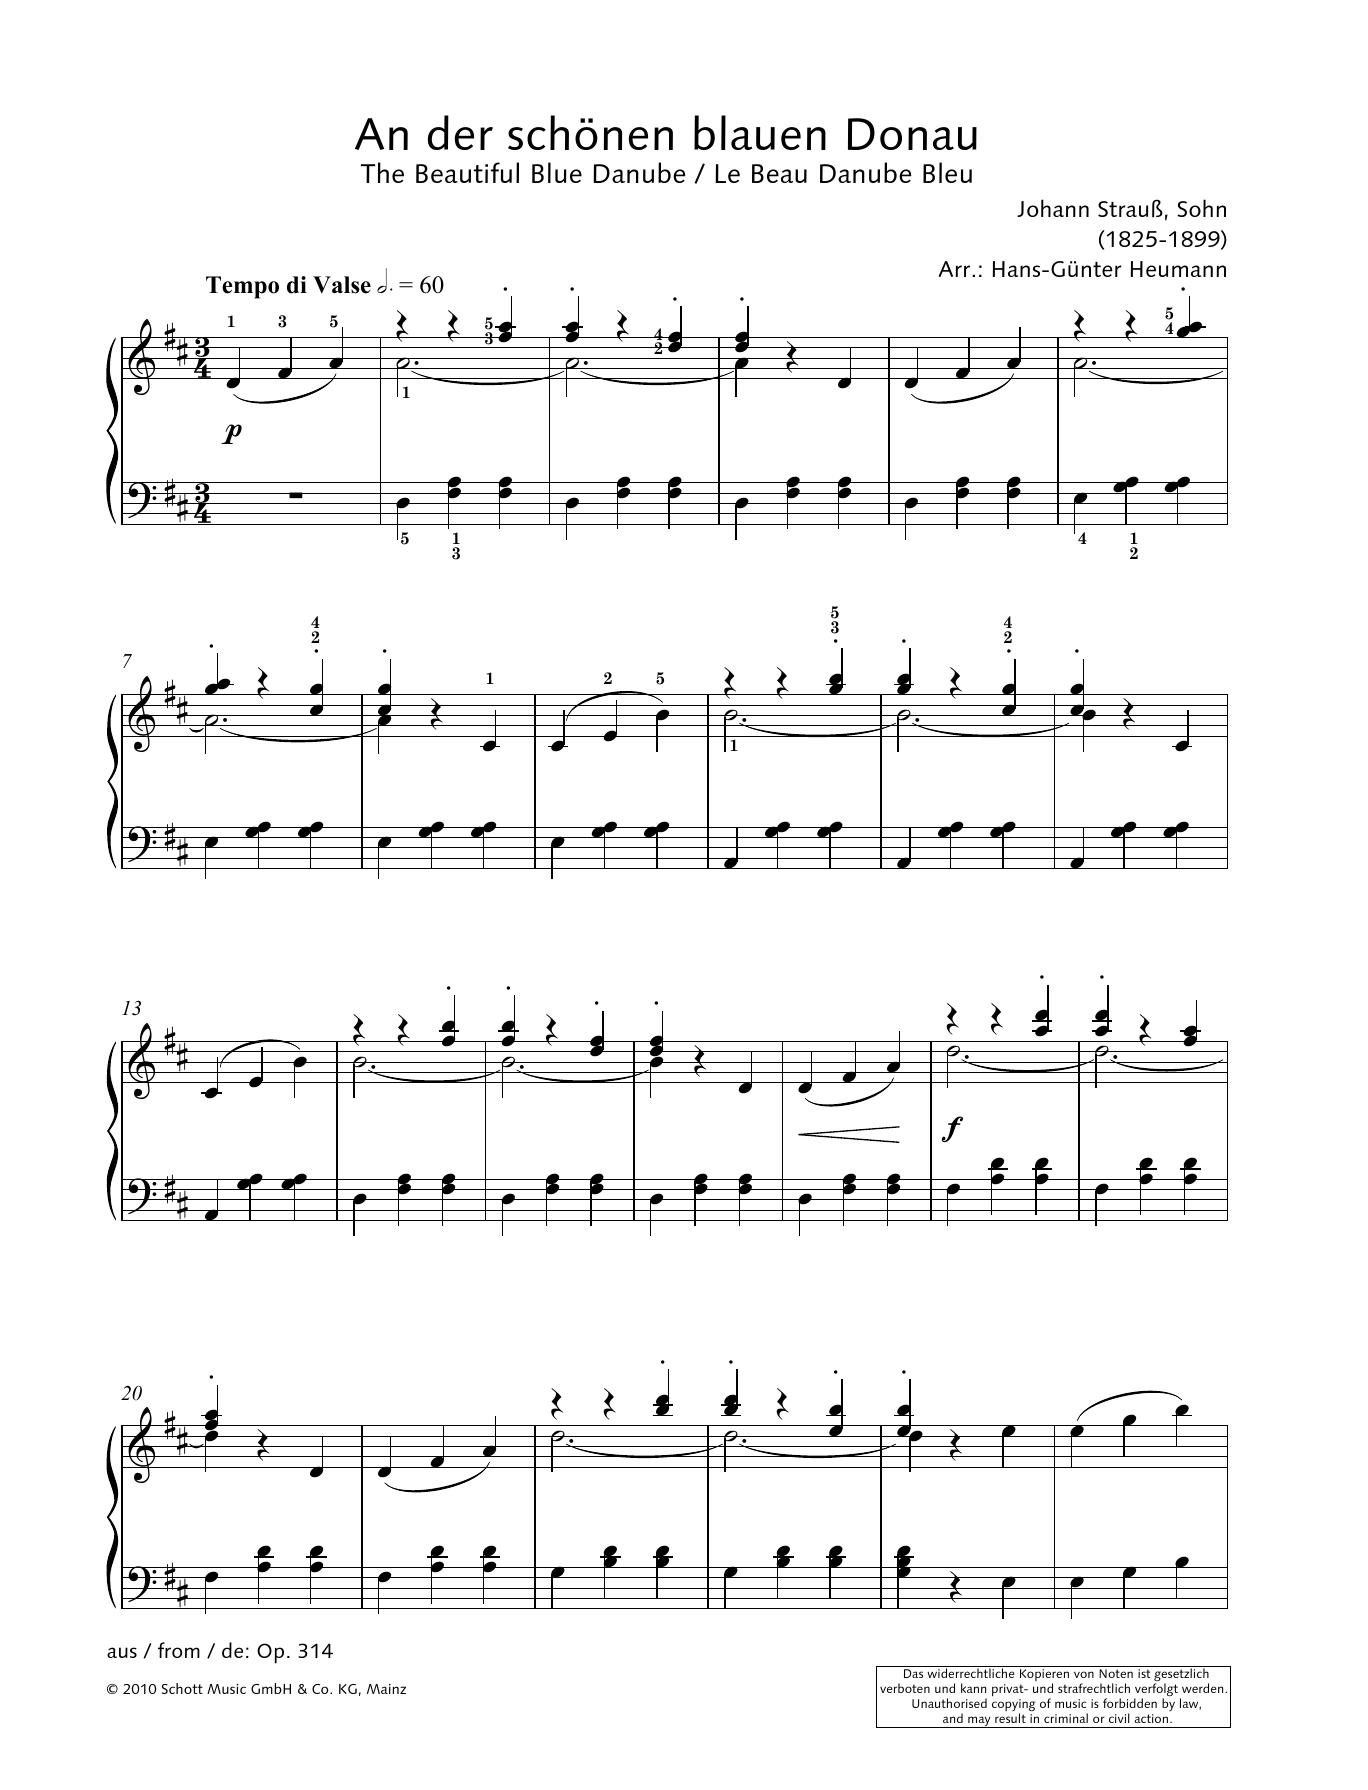 The Beautiful Blue Danube Sheet Music